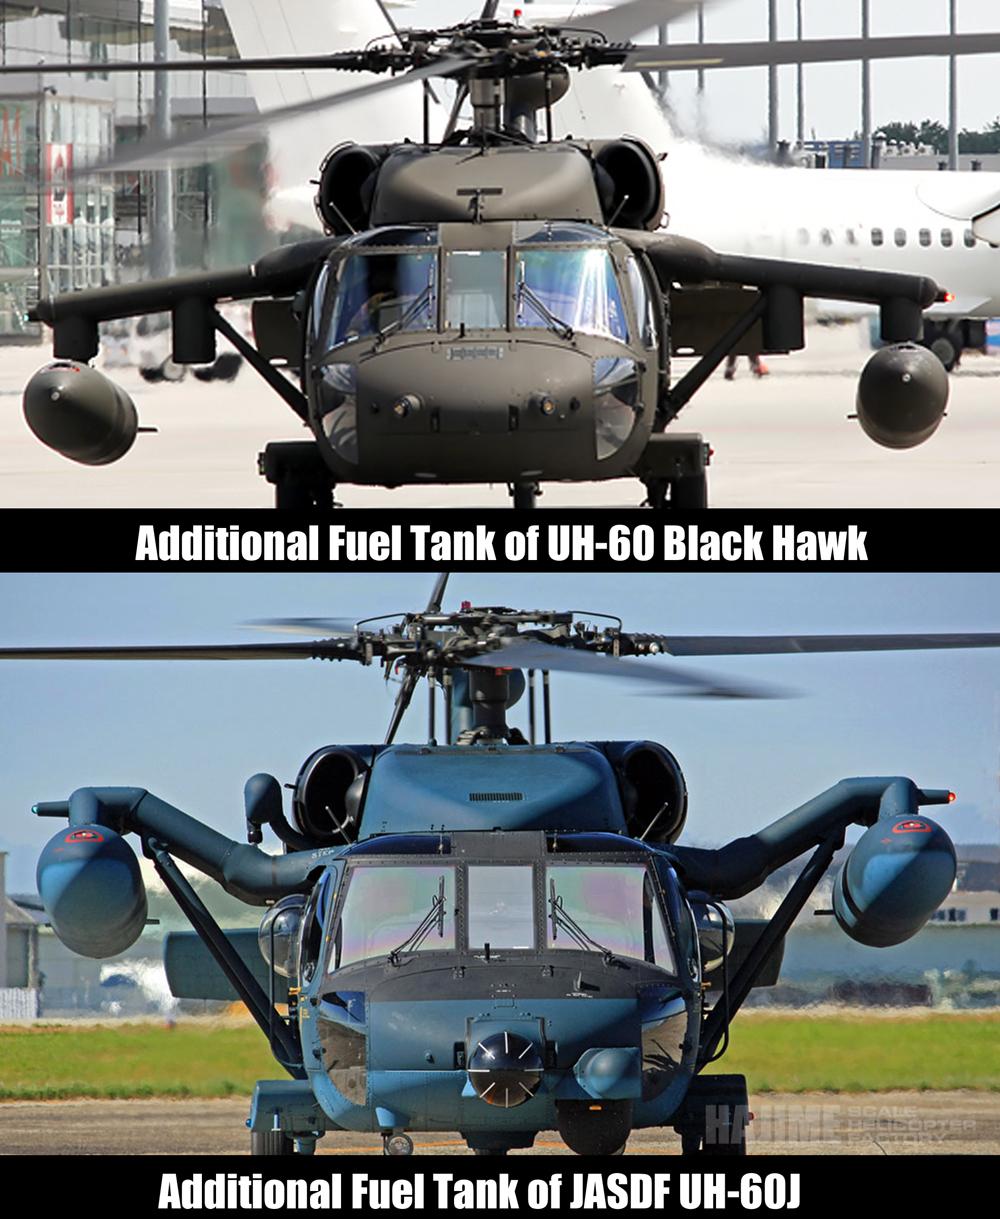 UH-60orUH-60J-2.jpg